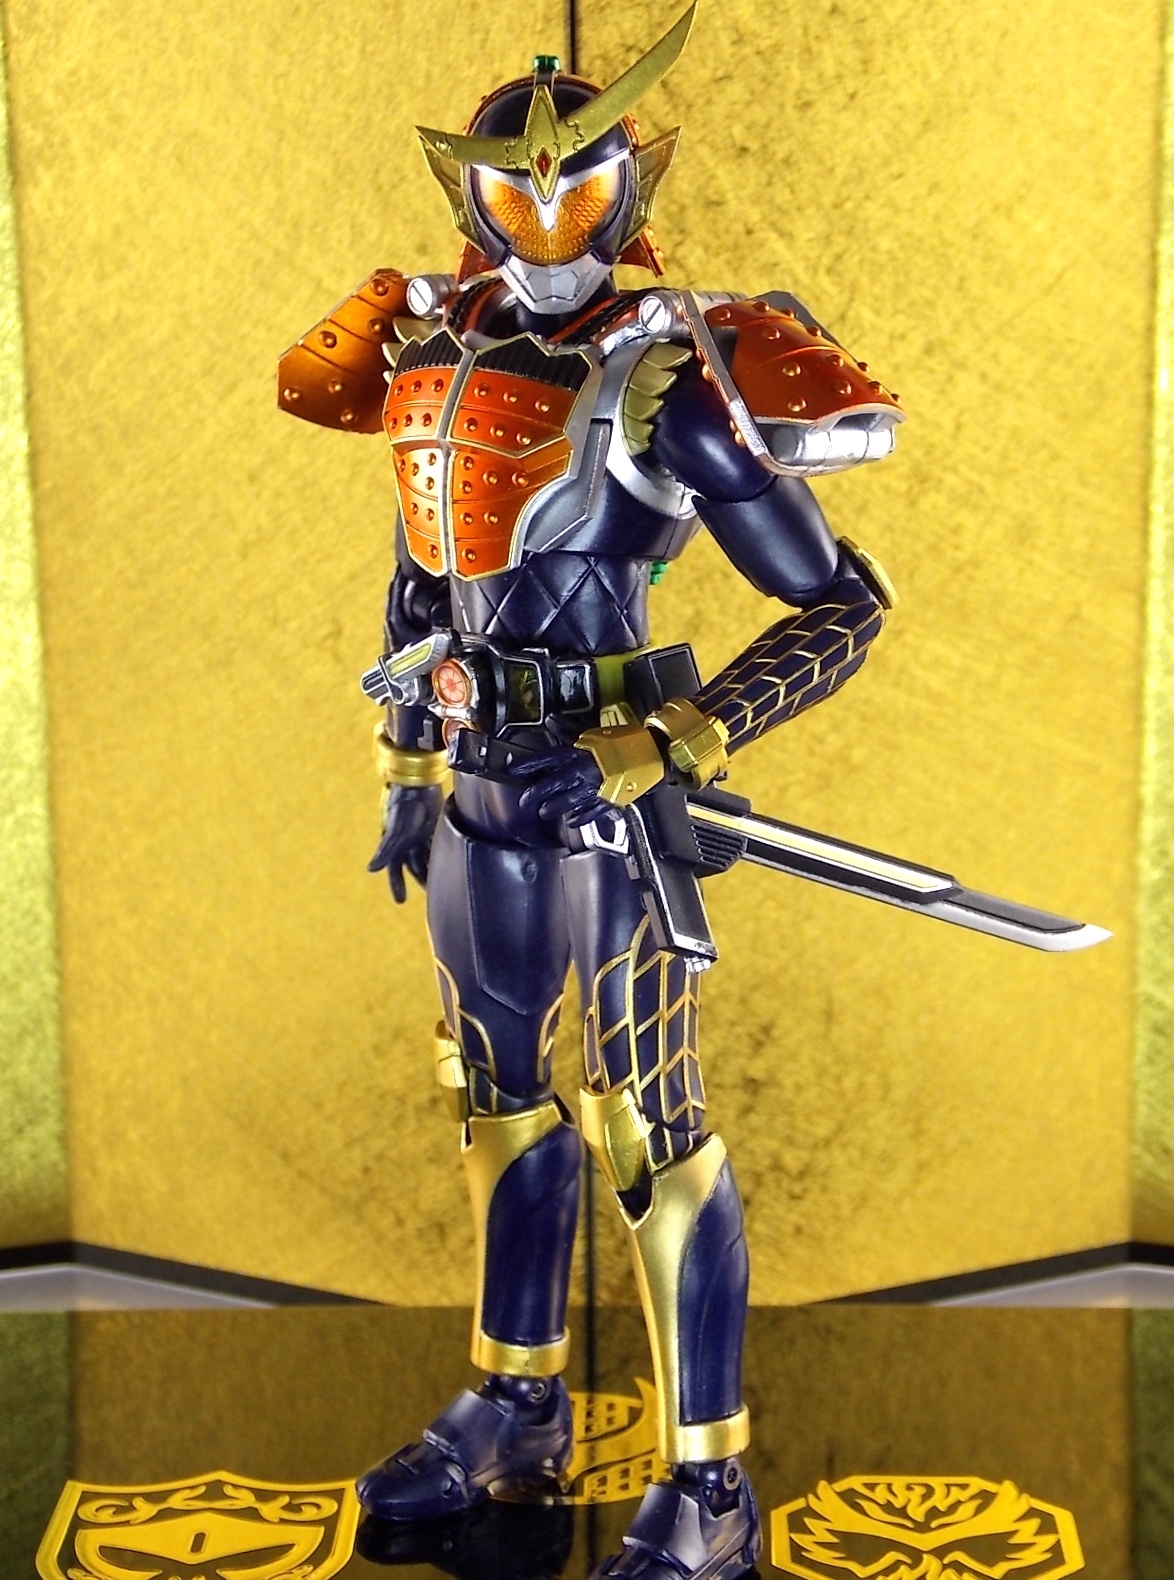 dating op kamen single gaim portal berlin rider  Kamen Rider Gaim: The Best Tokusatsu in Years, Den of Geek. Kamen Rider Gaim: The Best Tokusatsu in Years, Den of Geek.